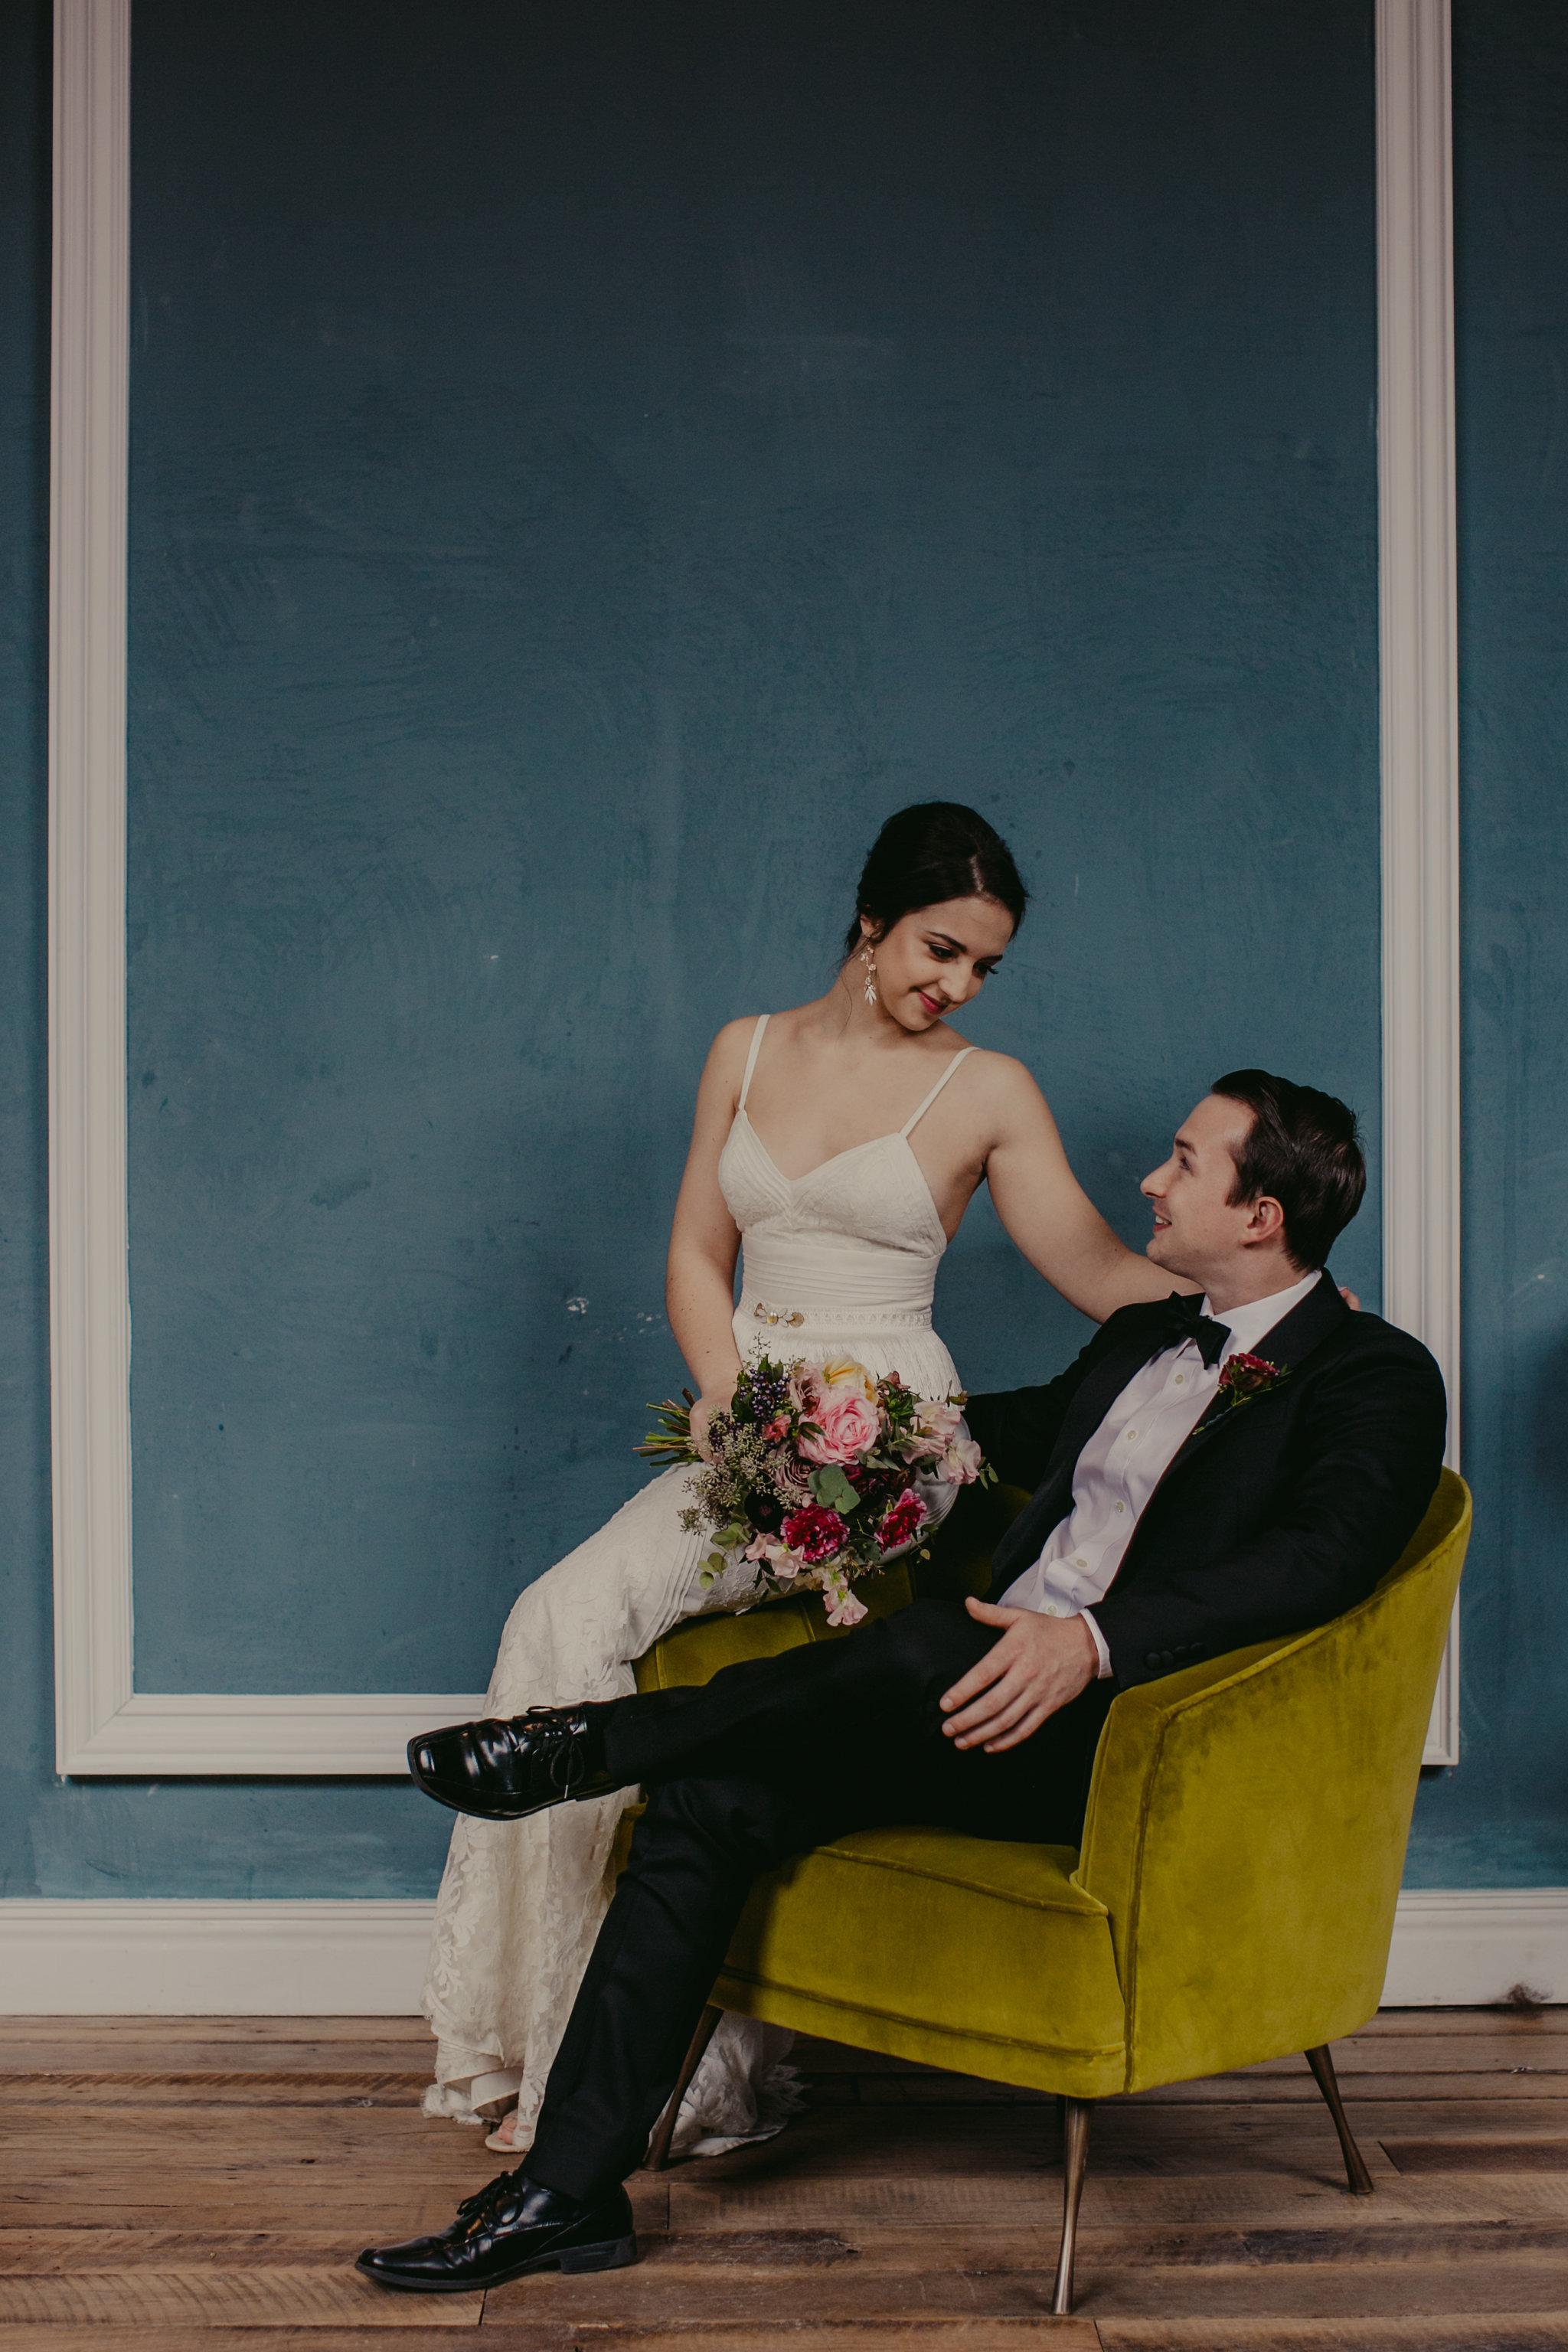 Williamsburg_Hotel_Wedding_Photographer_Chellise_Michael_Photography-216.jpg